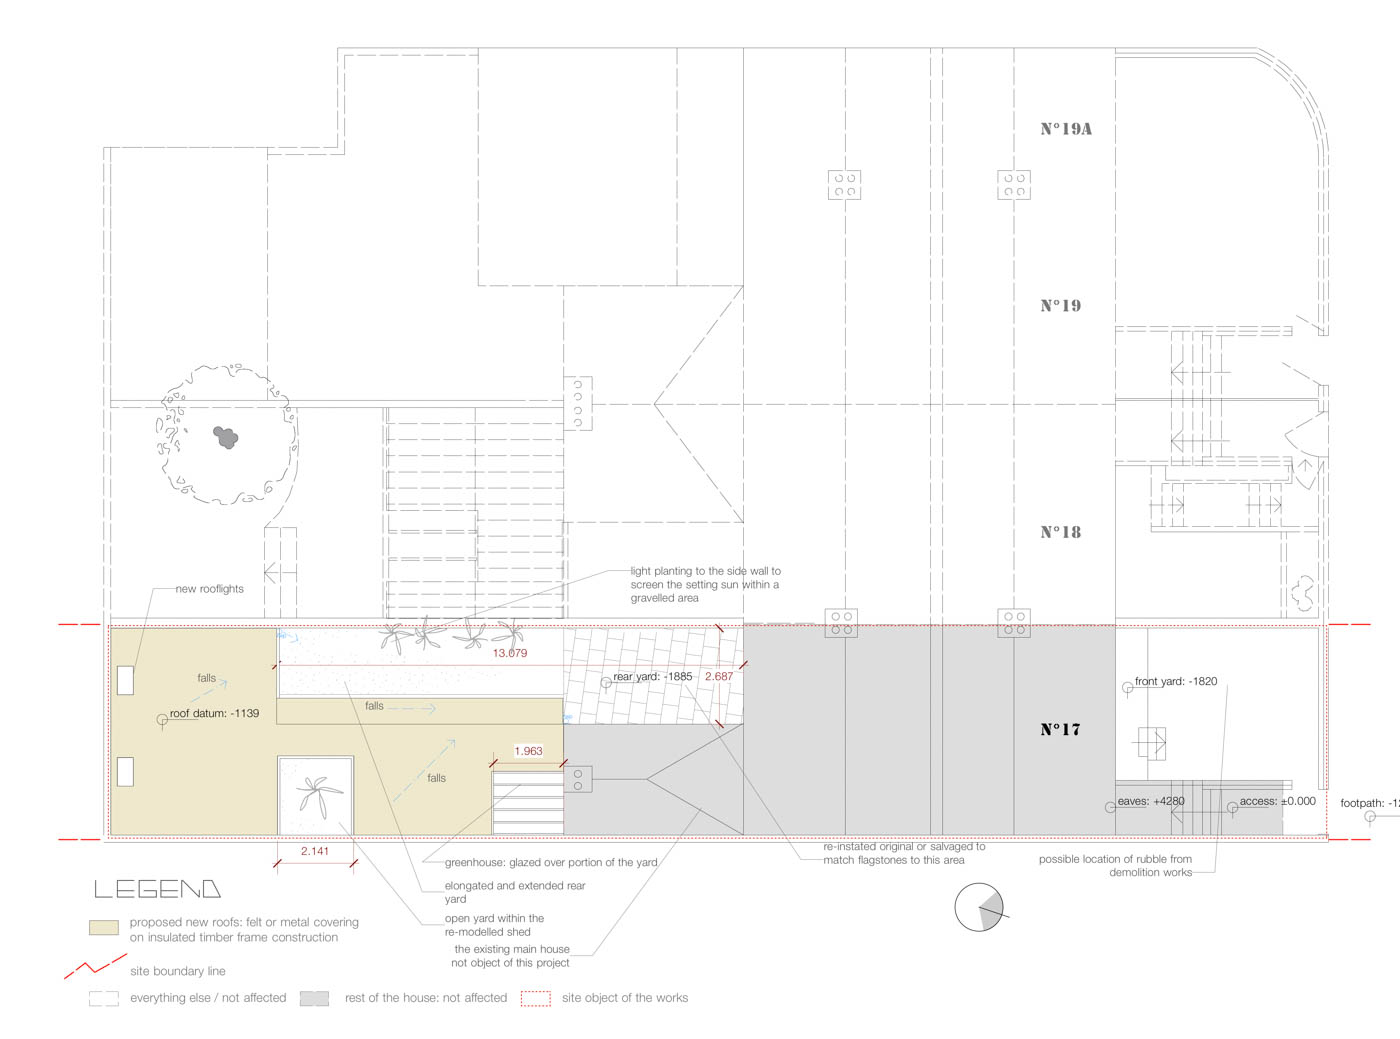 17-site plan